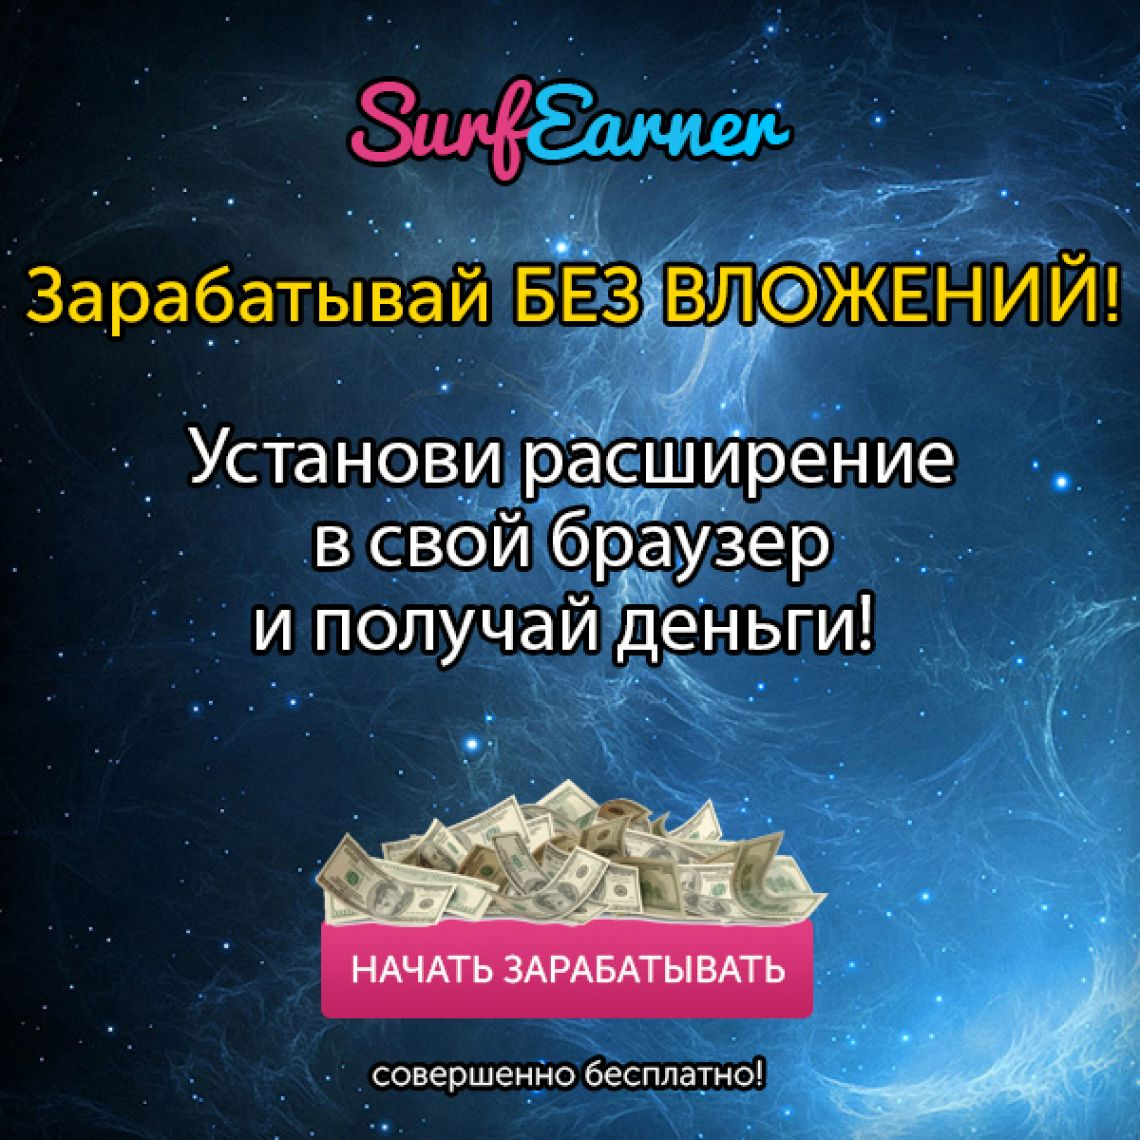 SurfEarner - Заработок и Продвижение!!! https://money24.pro/271776